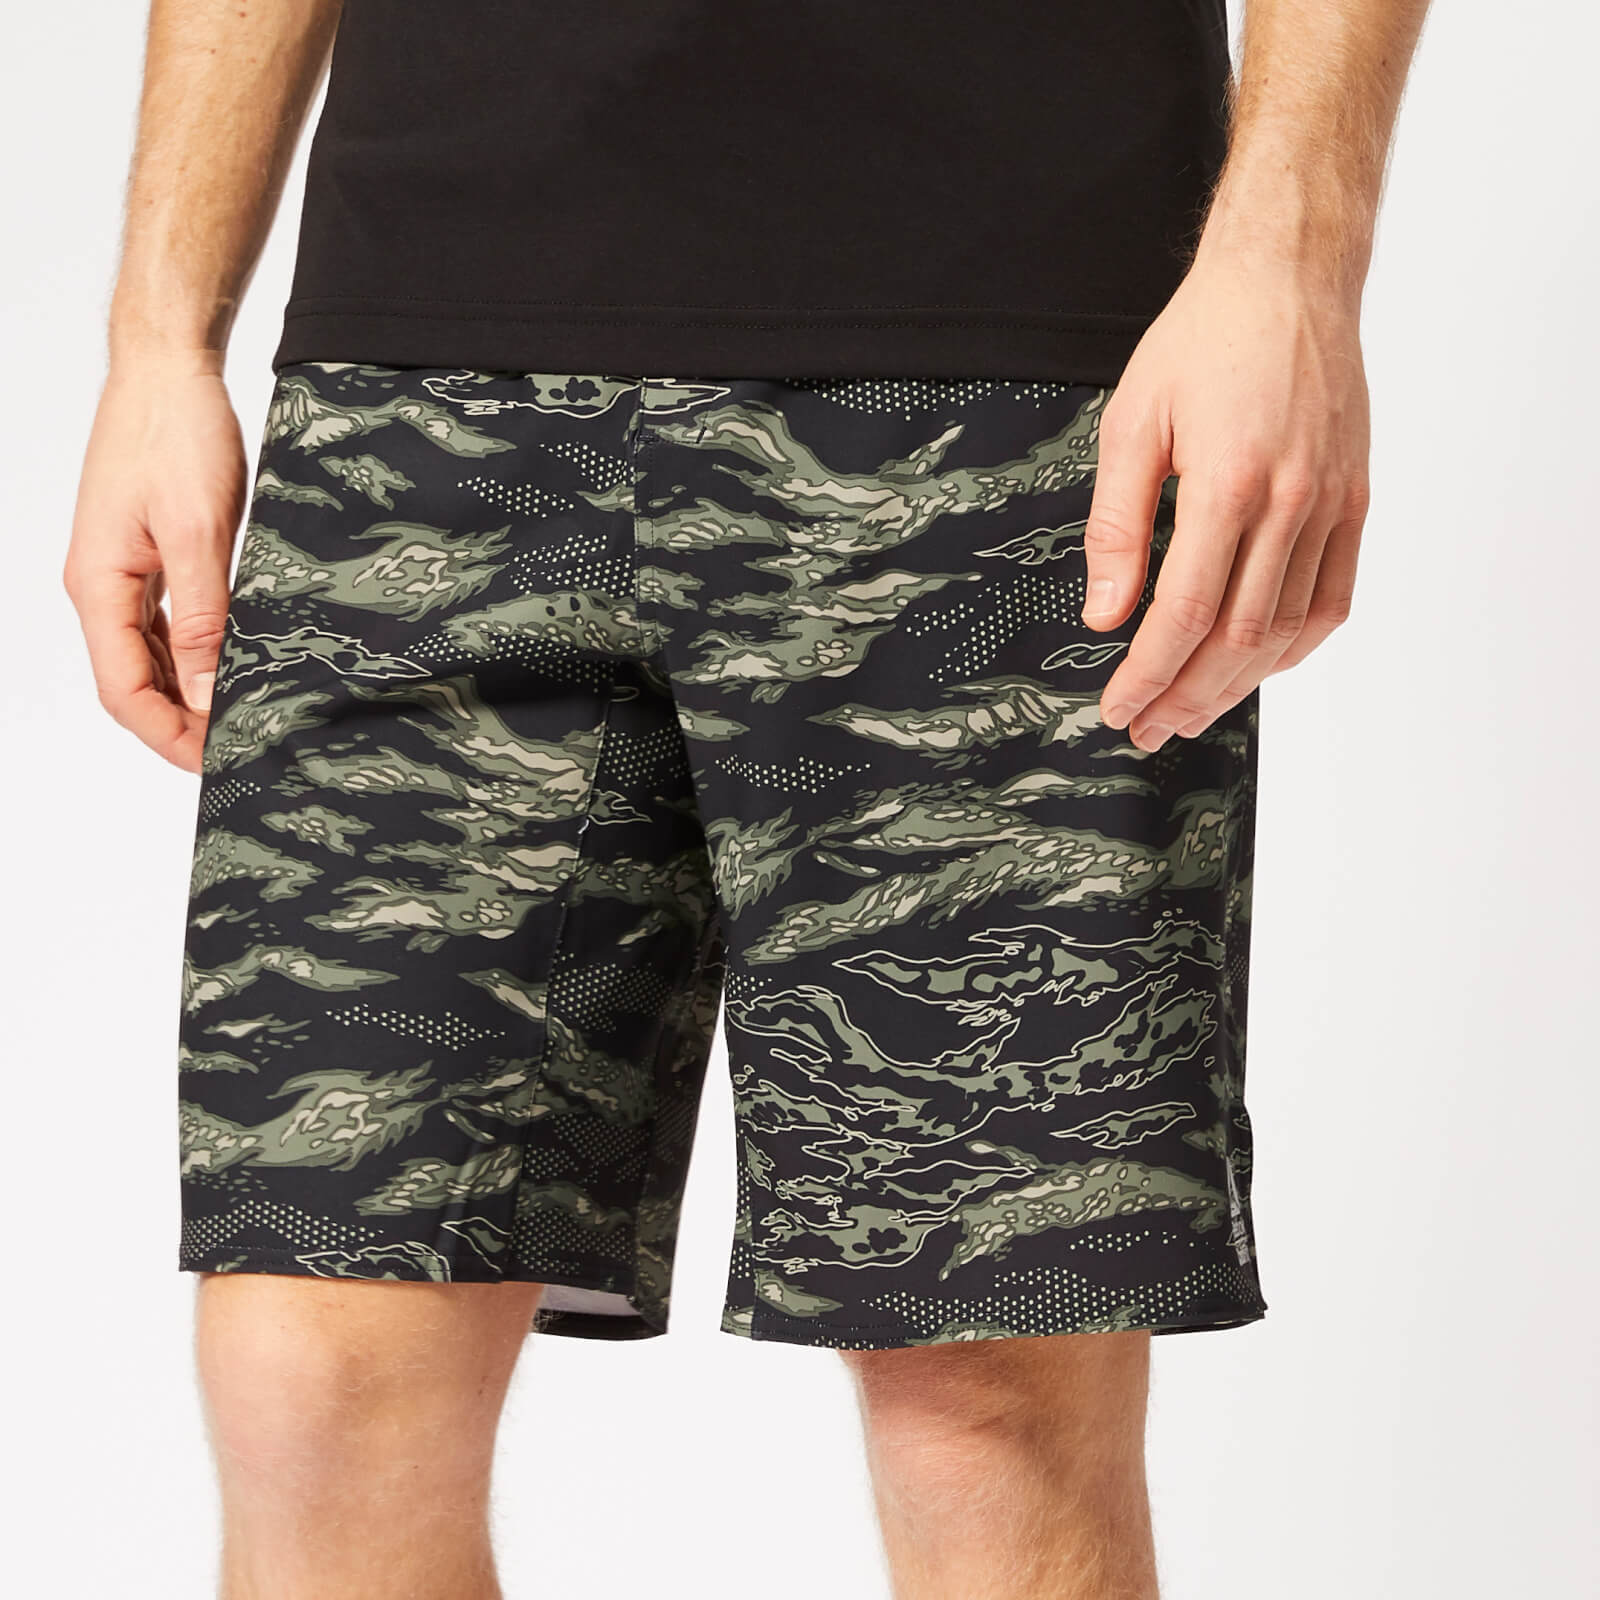 Reebok Men's Crossfit Epic Cordlock Shorts Camo